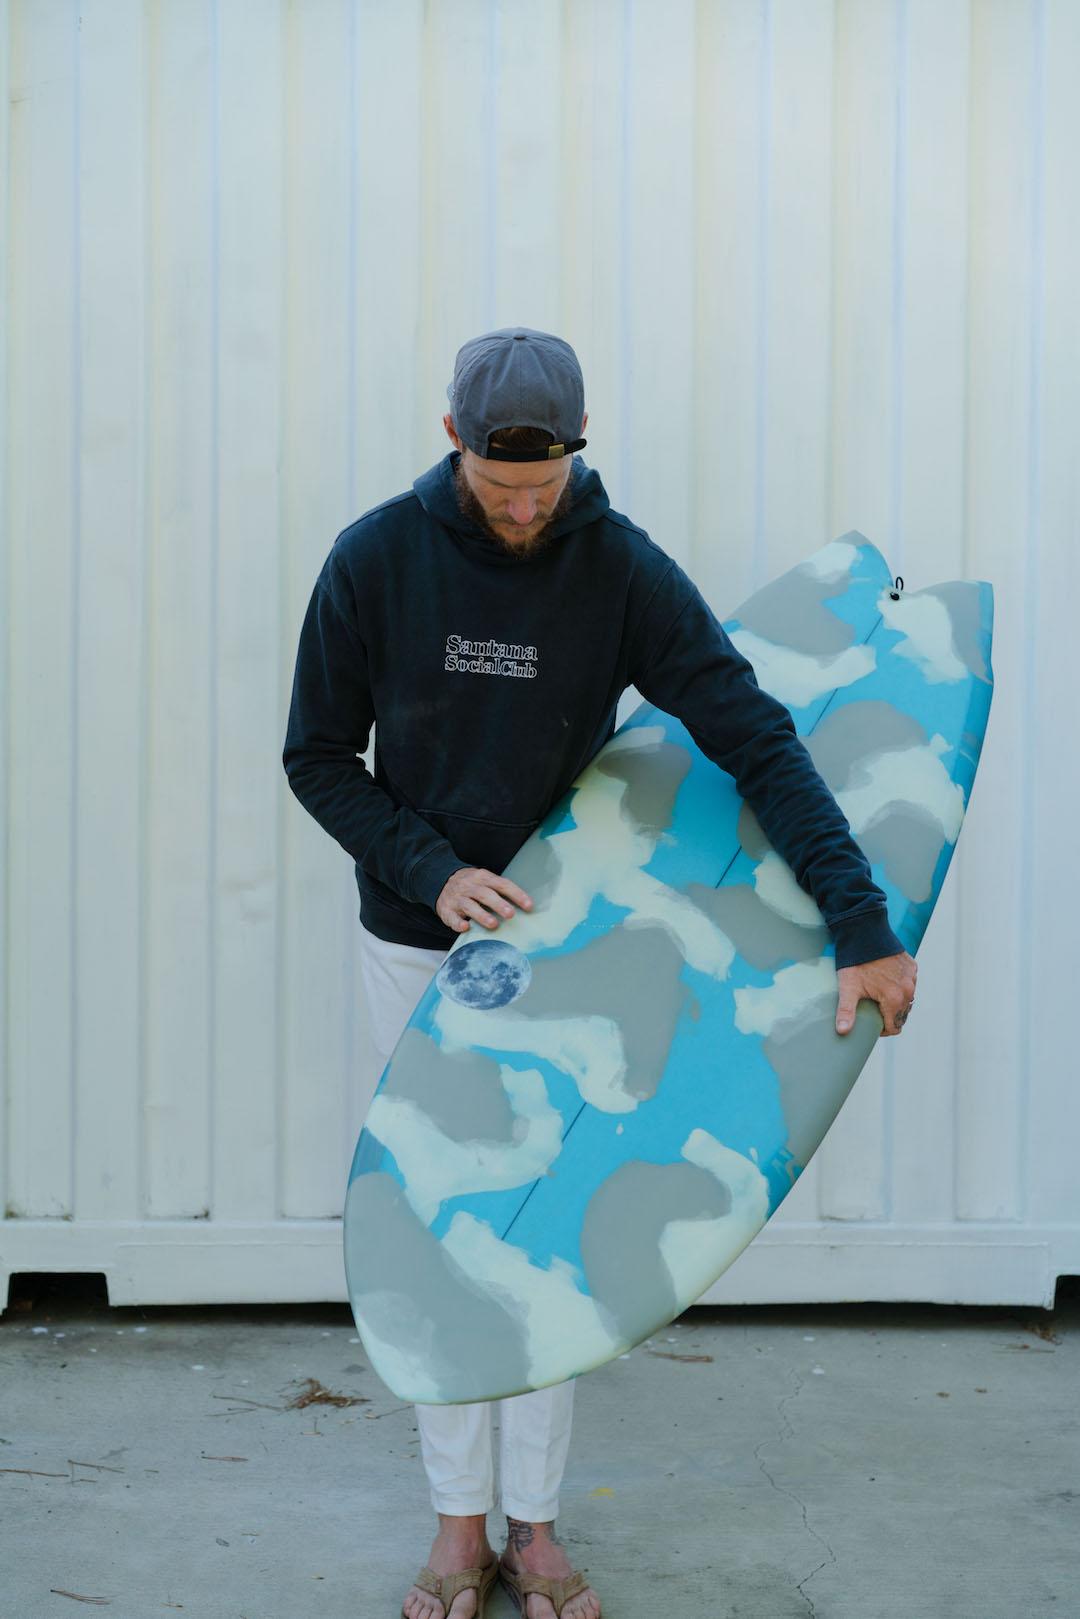 tyler-jorgenson-wax-surf-co-santana-social-club-menswear-sean-ryan-pierce-photography-surf-surfboard-surfing-made-in-america-11.jpg